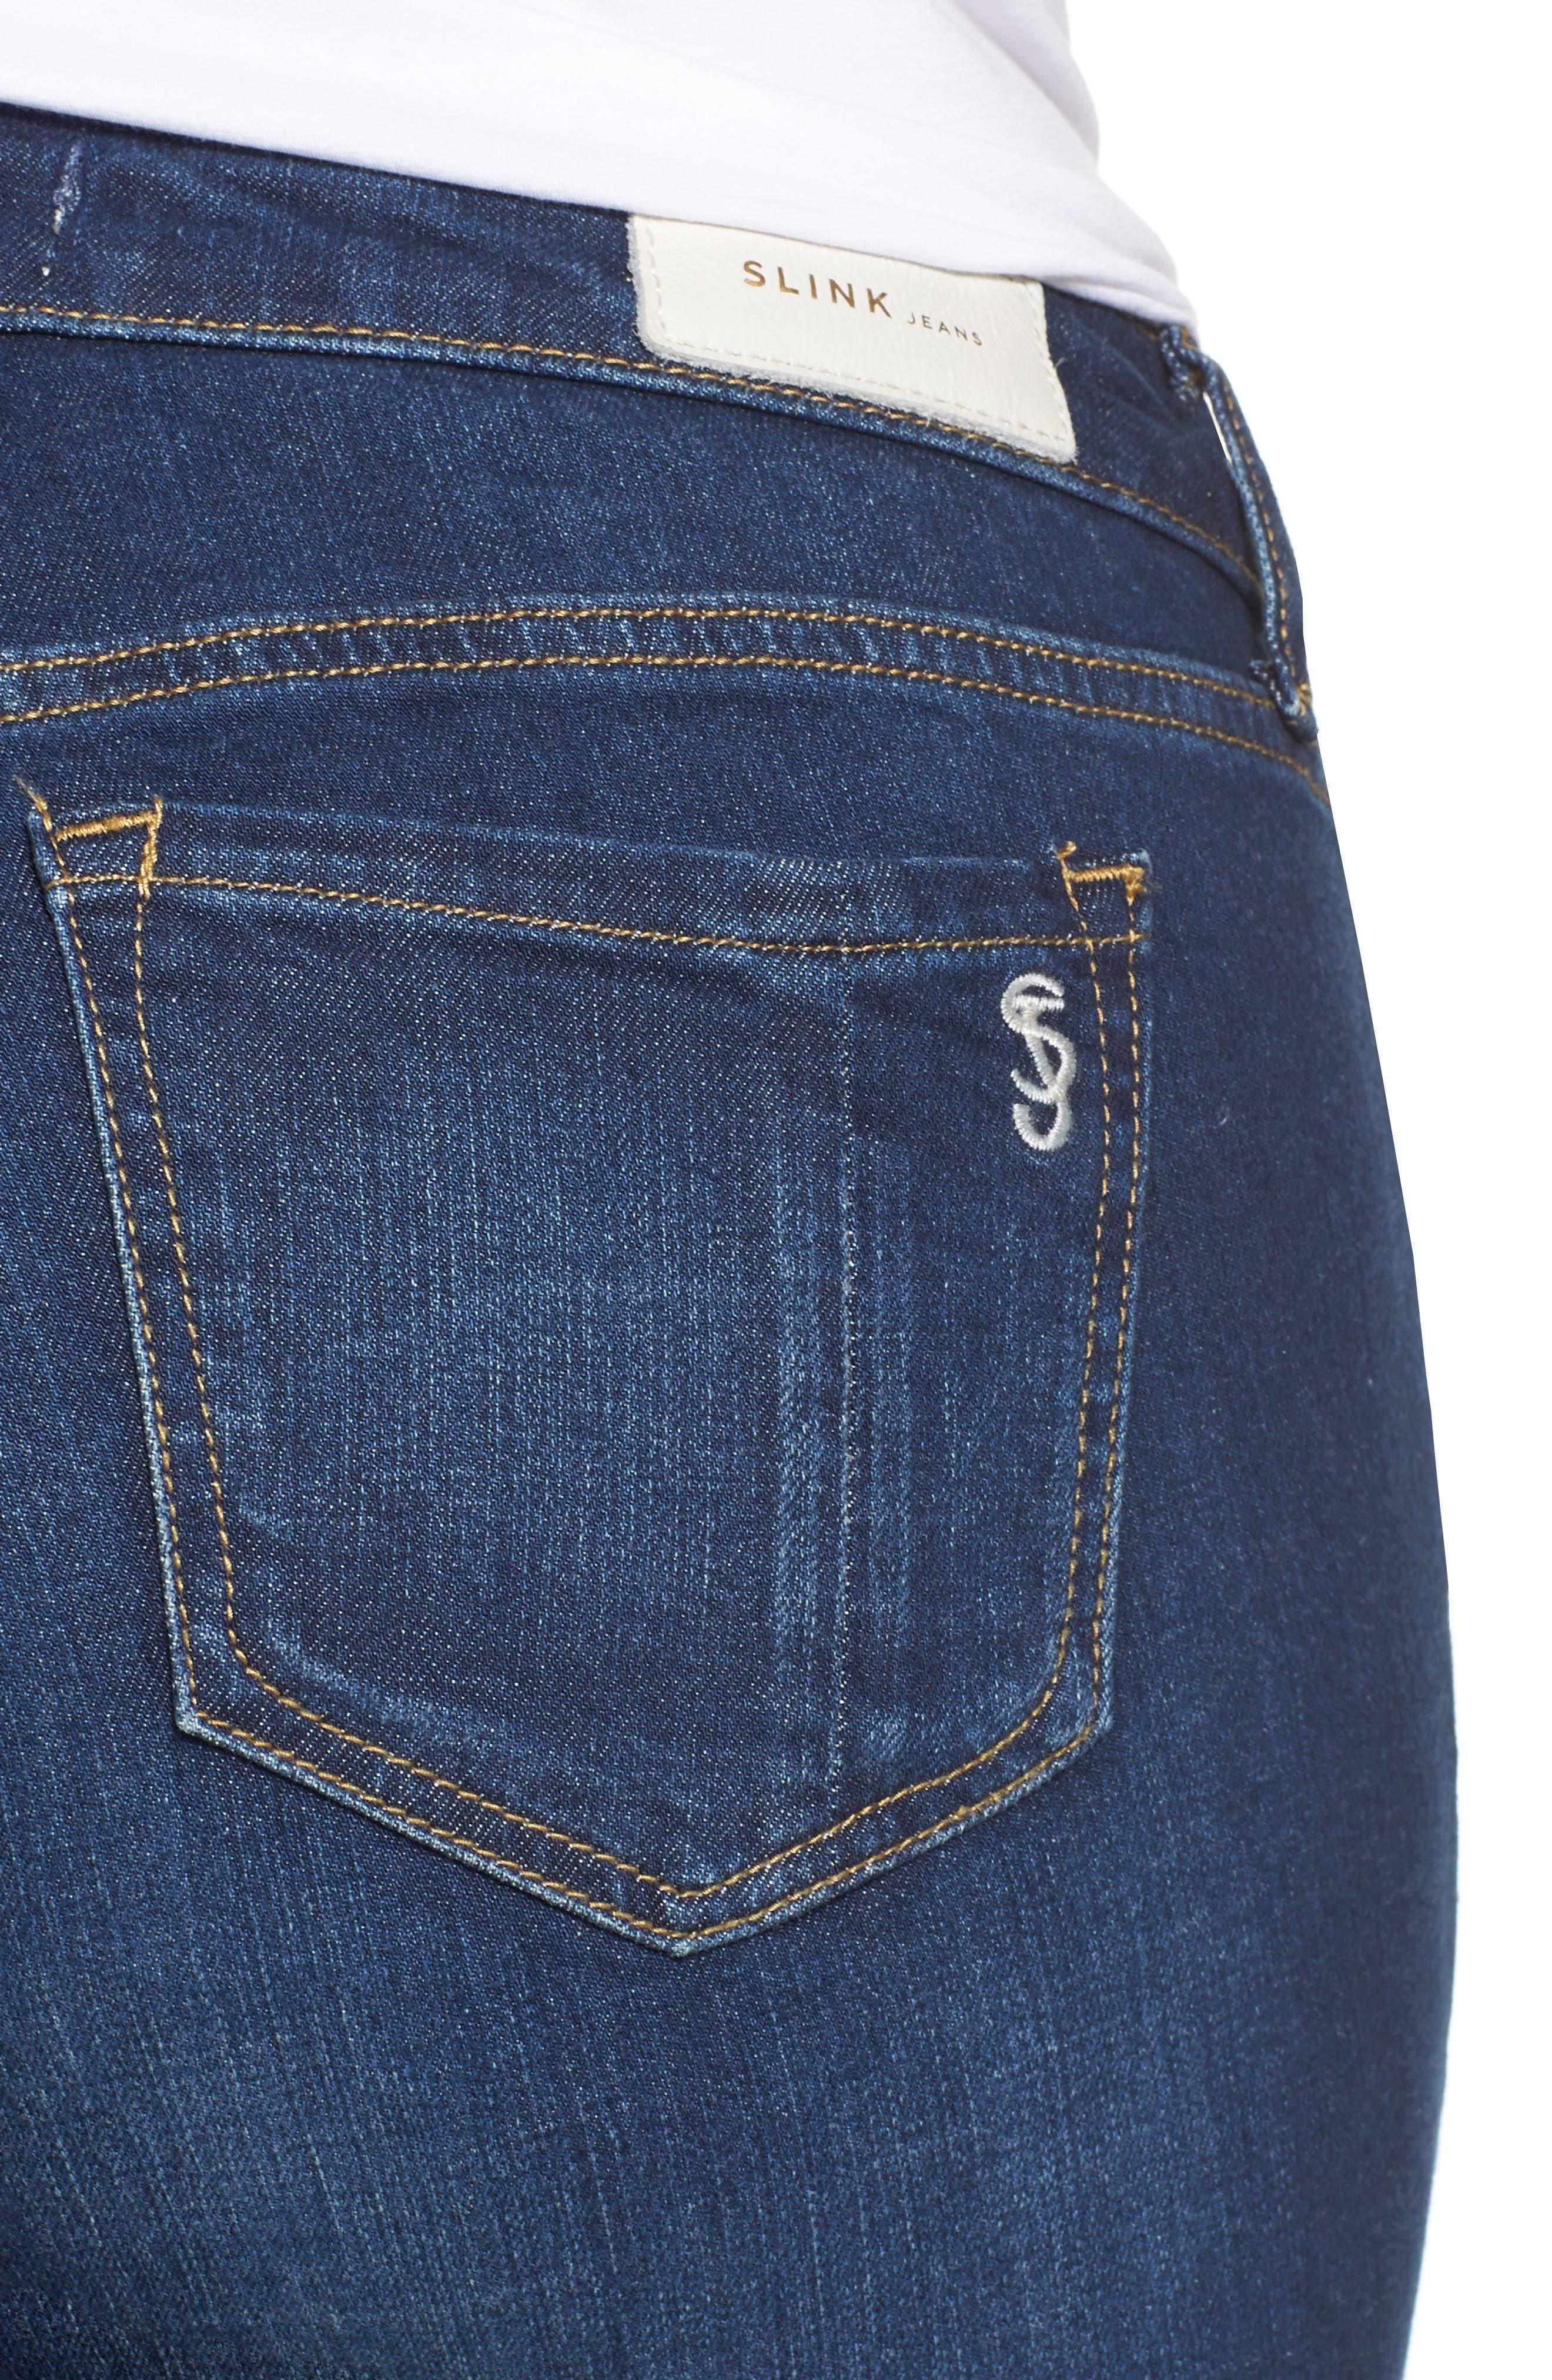 Roll Crop Boyfriend Jeans,                             Alternate thumbnail 4, color,                             AMBER